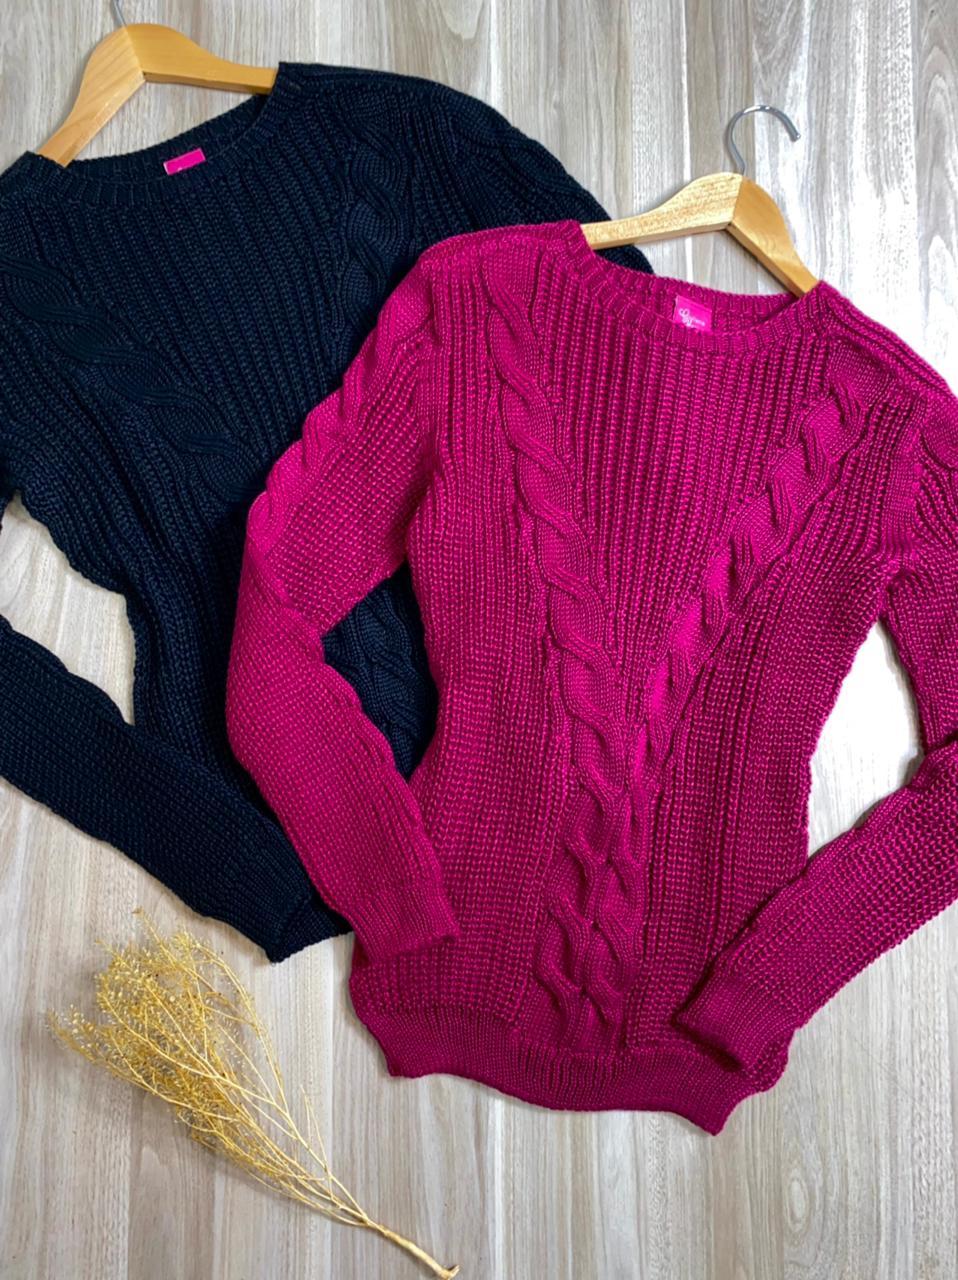 Blusa Tricot com detalhes Renata